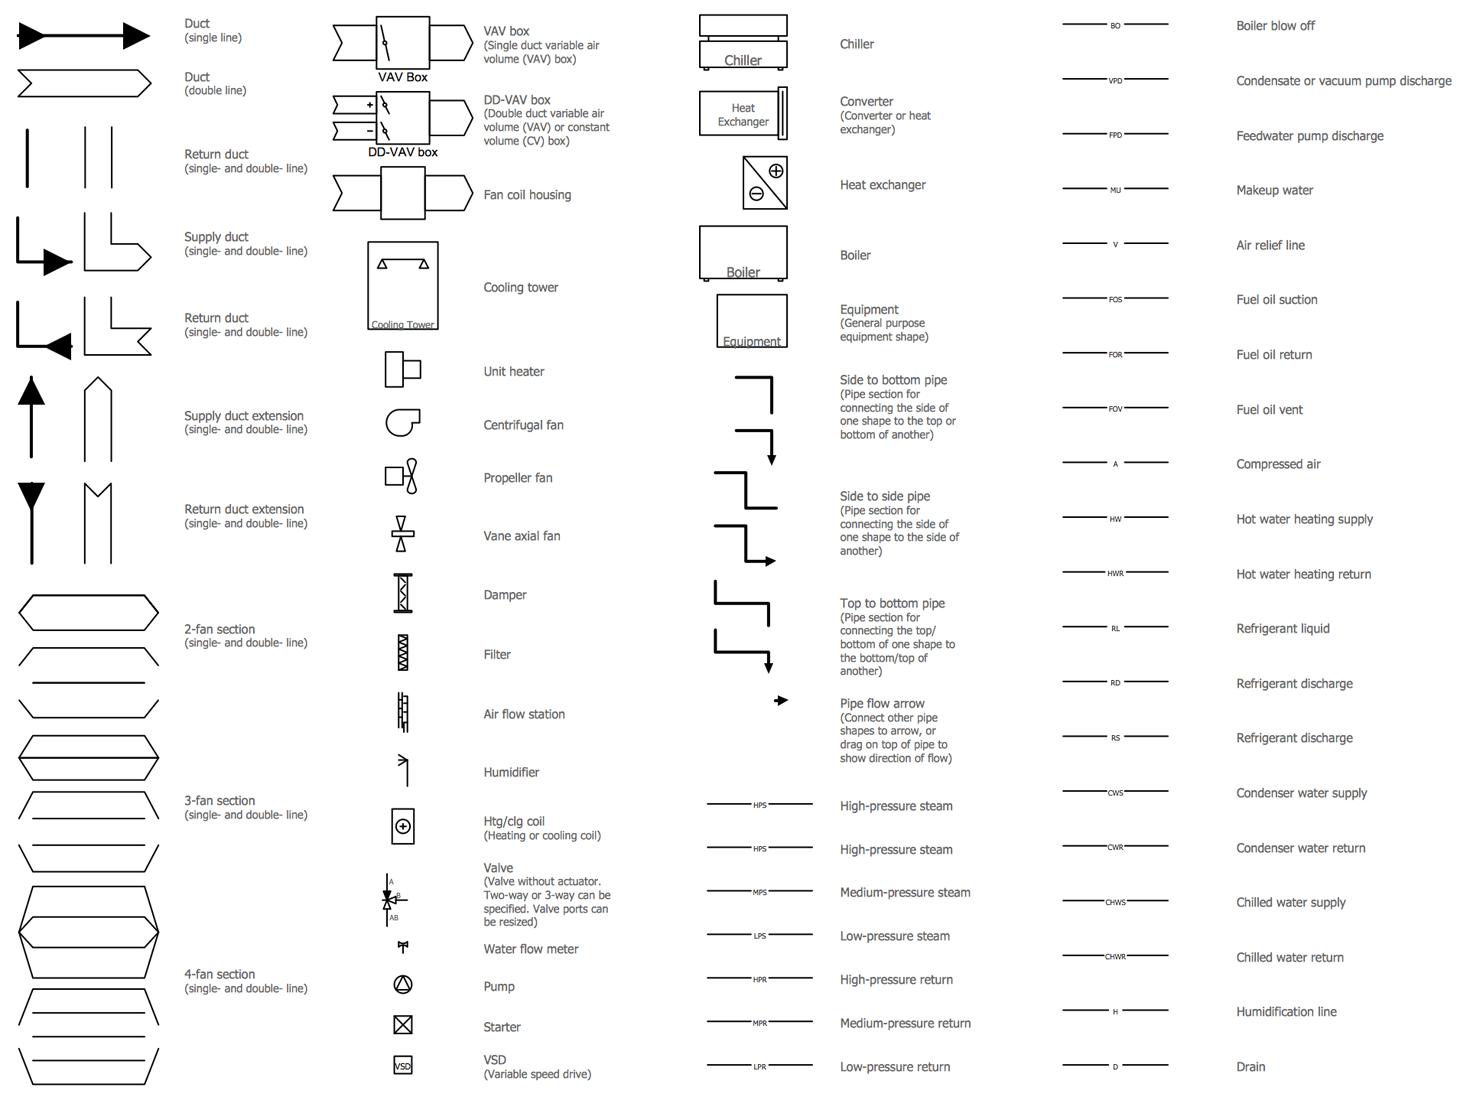 Design Elements — HVAC Control Equipment